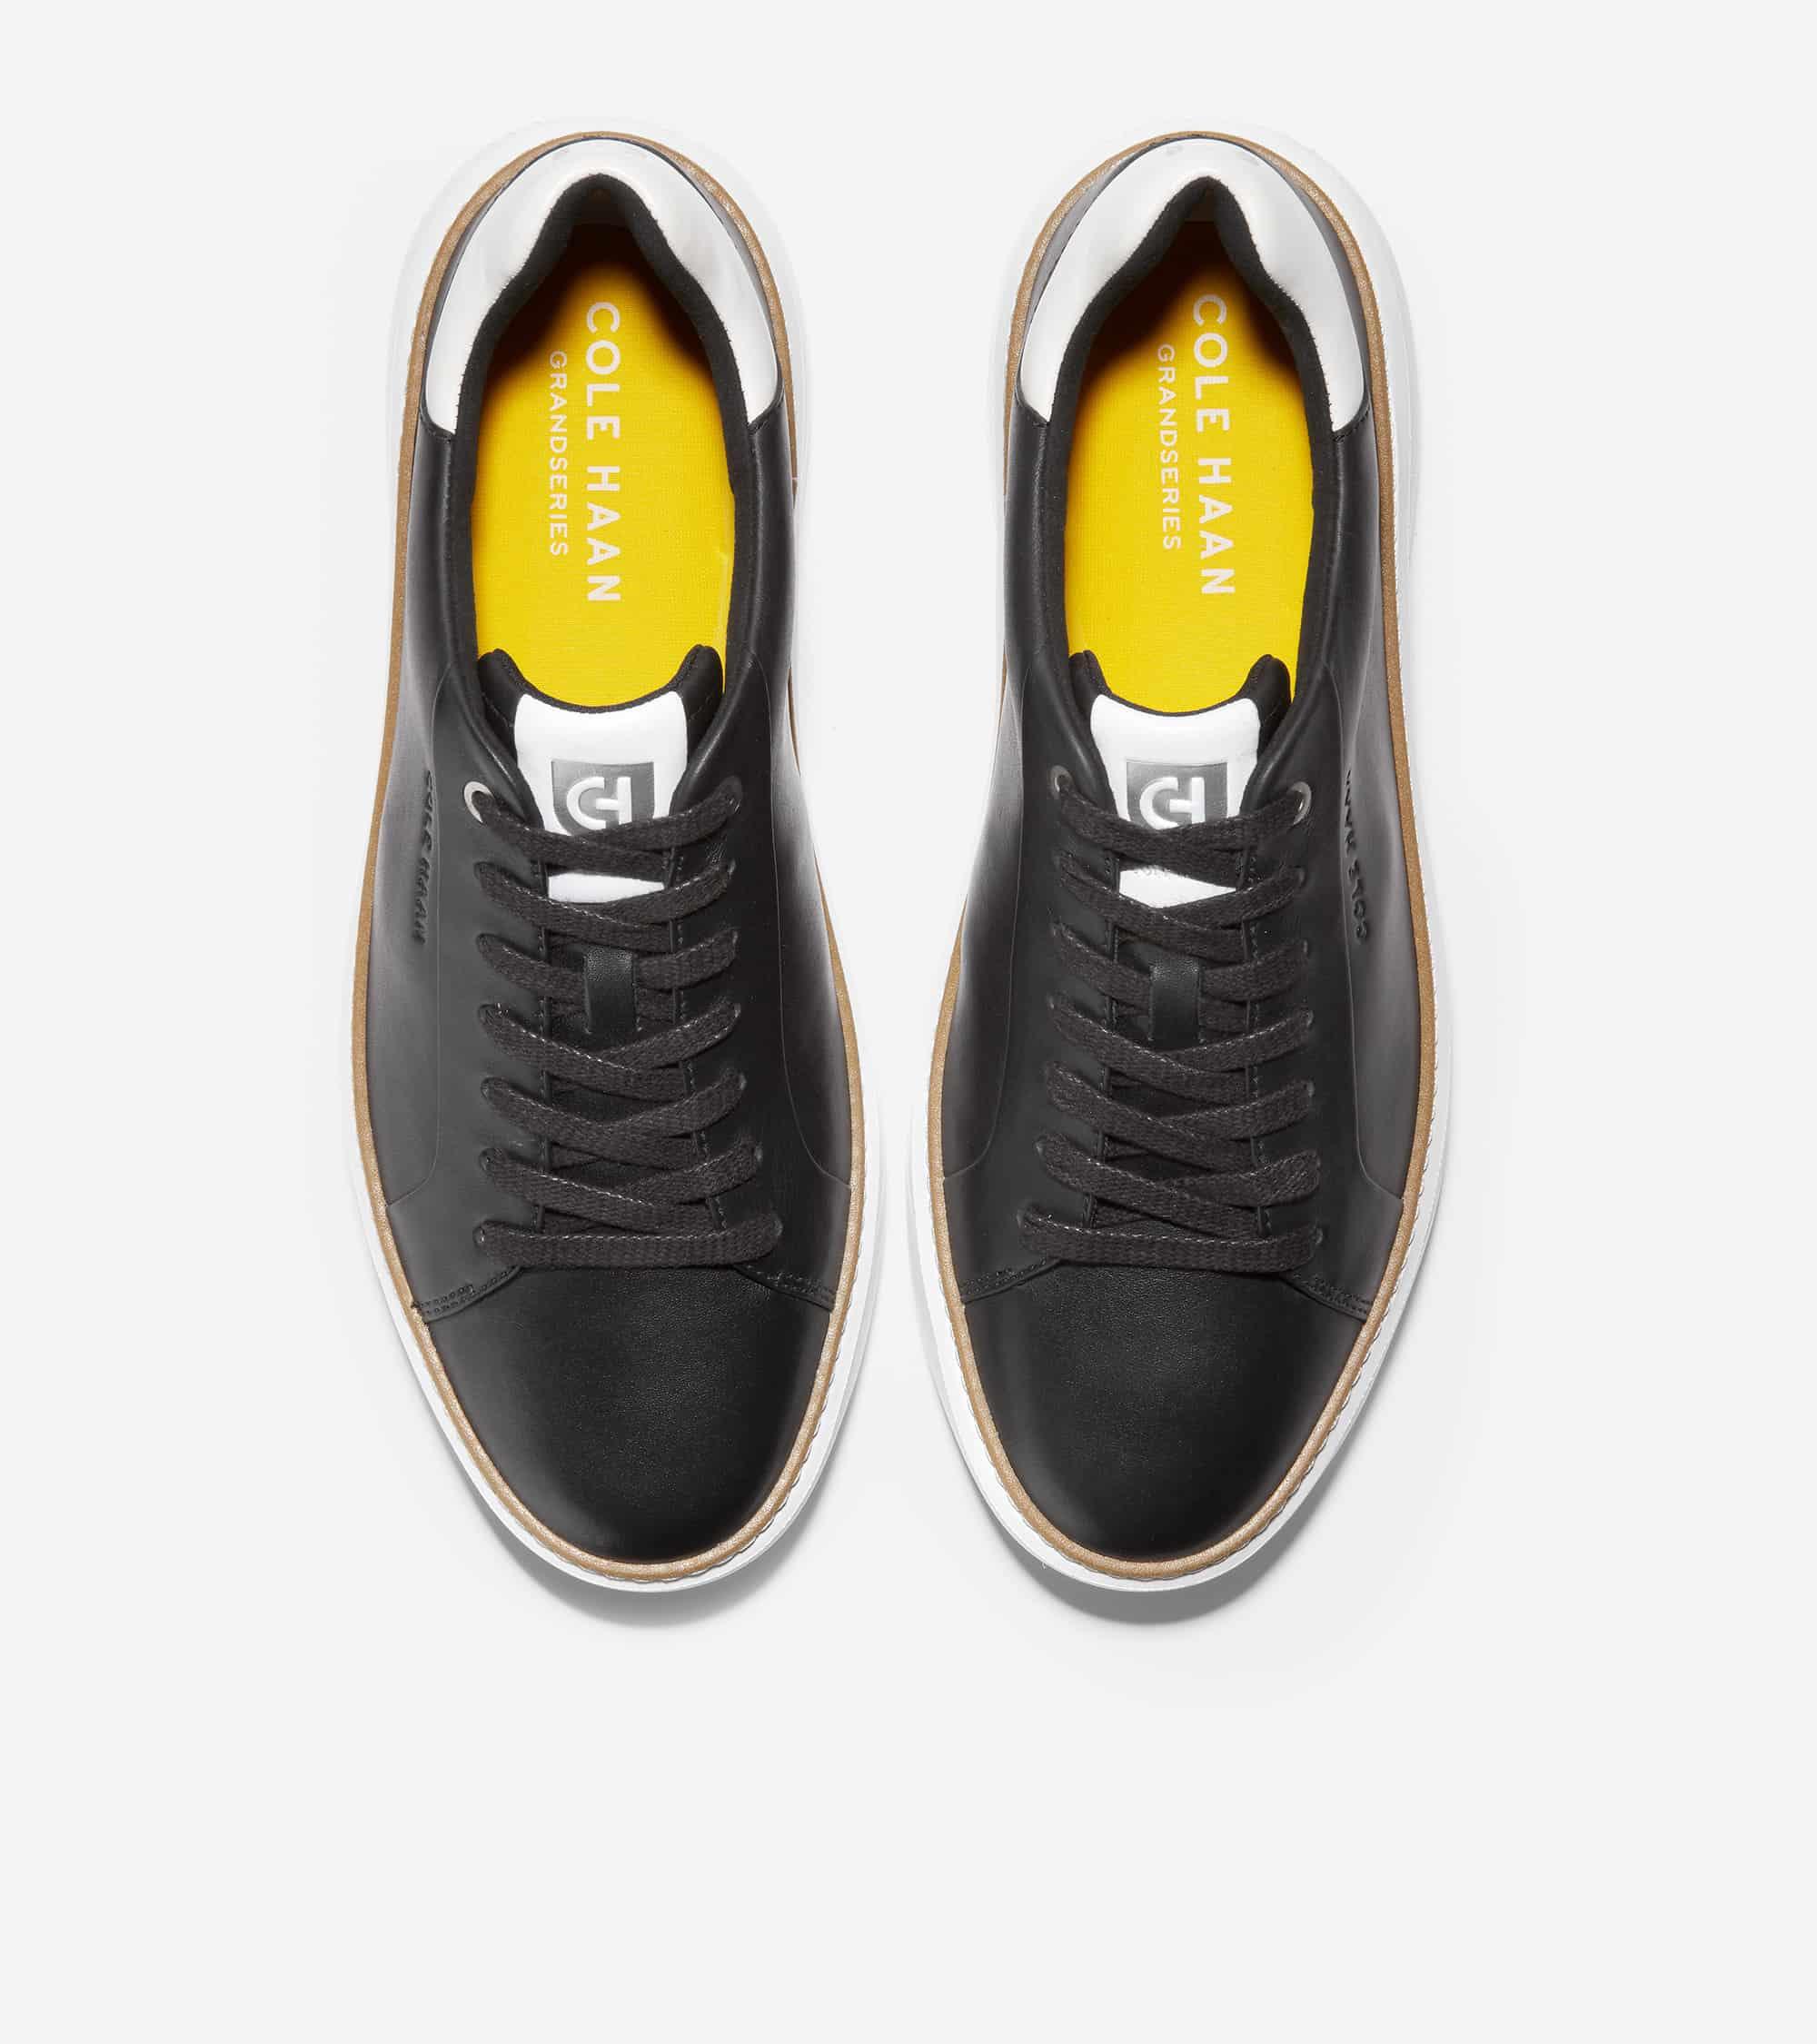 Cole Haan GrandPrø Topspin Sneaker Black